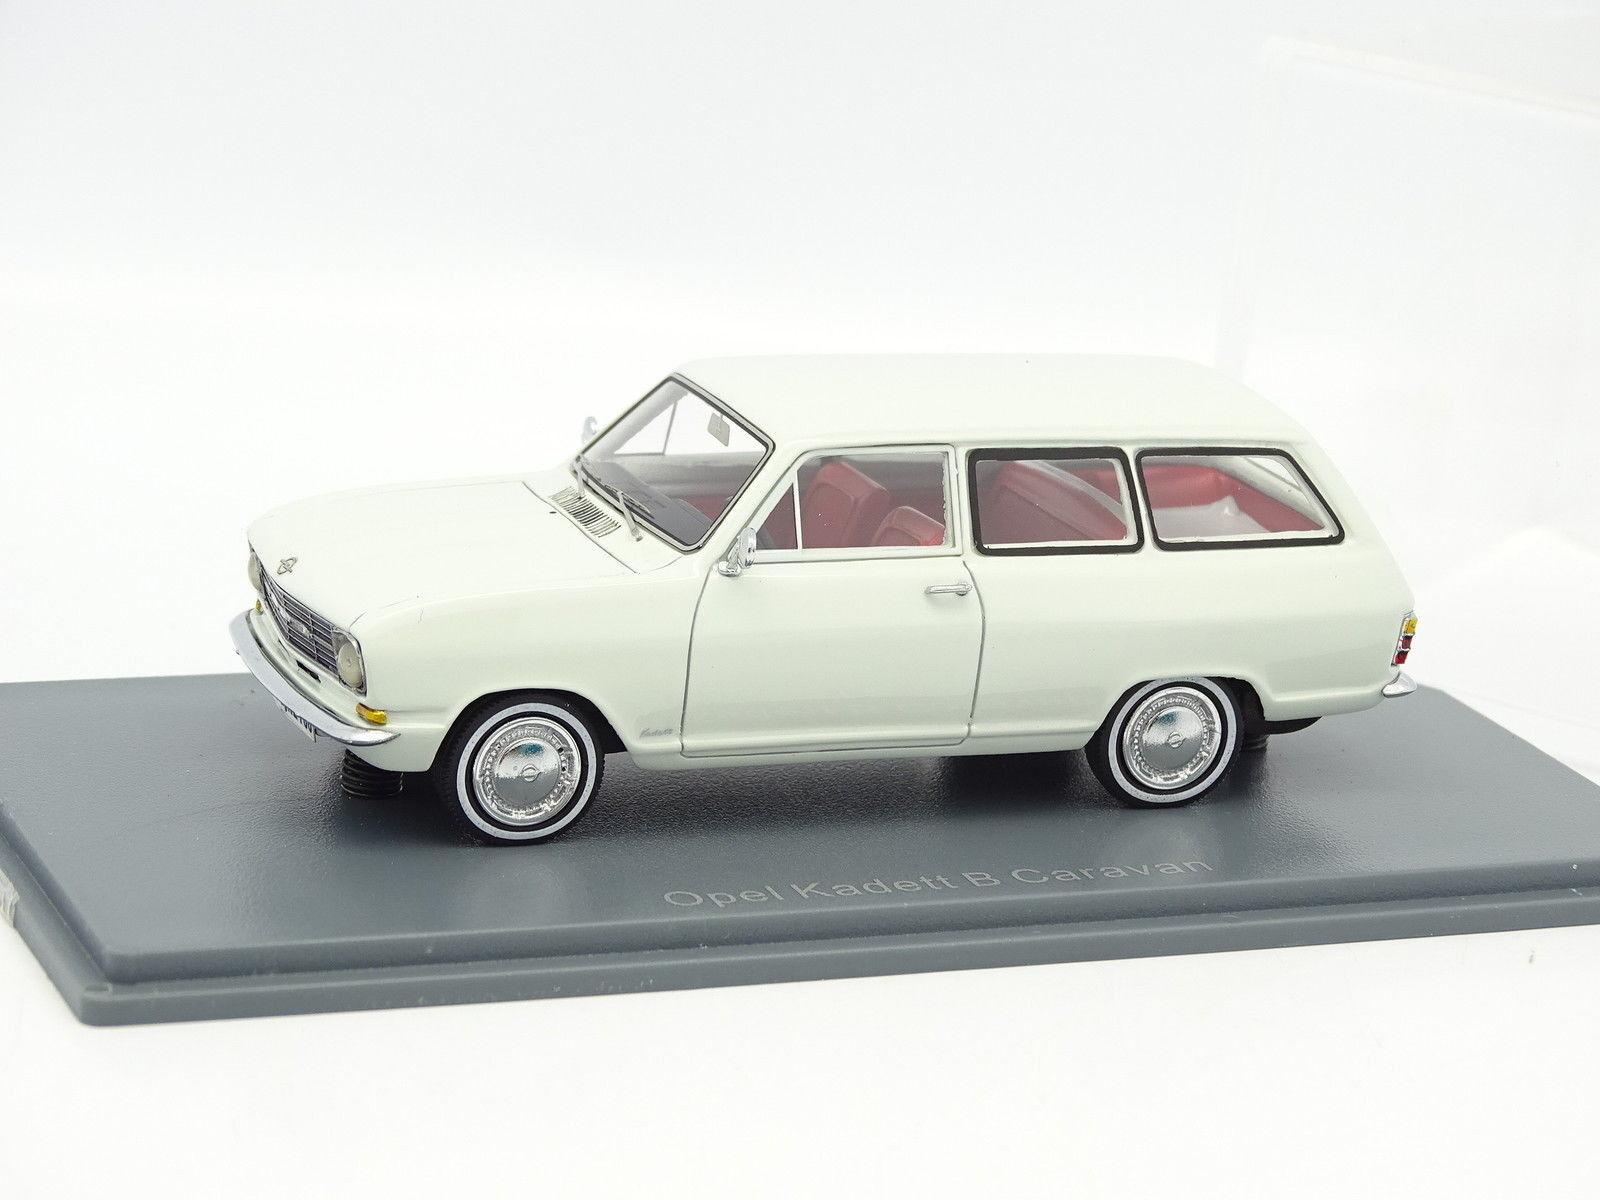 Neo 1 43 - opel kadett b caravan white